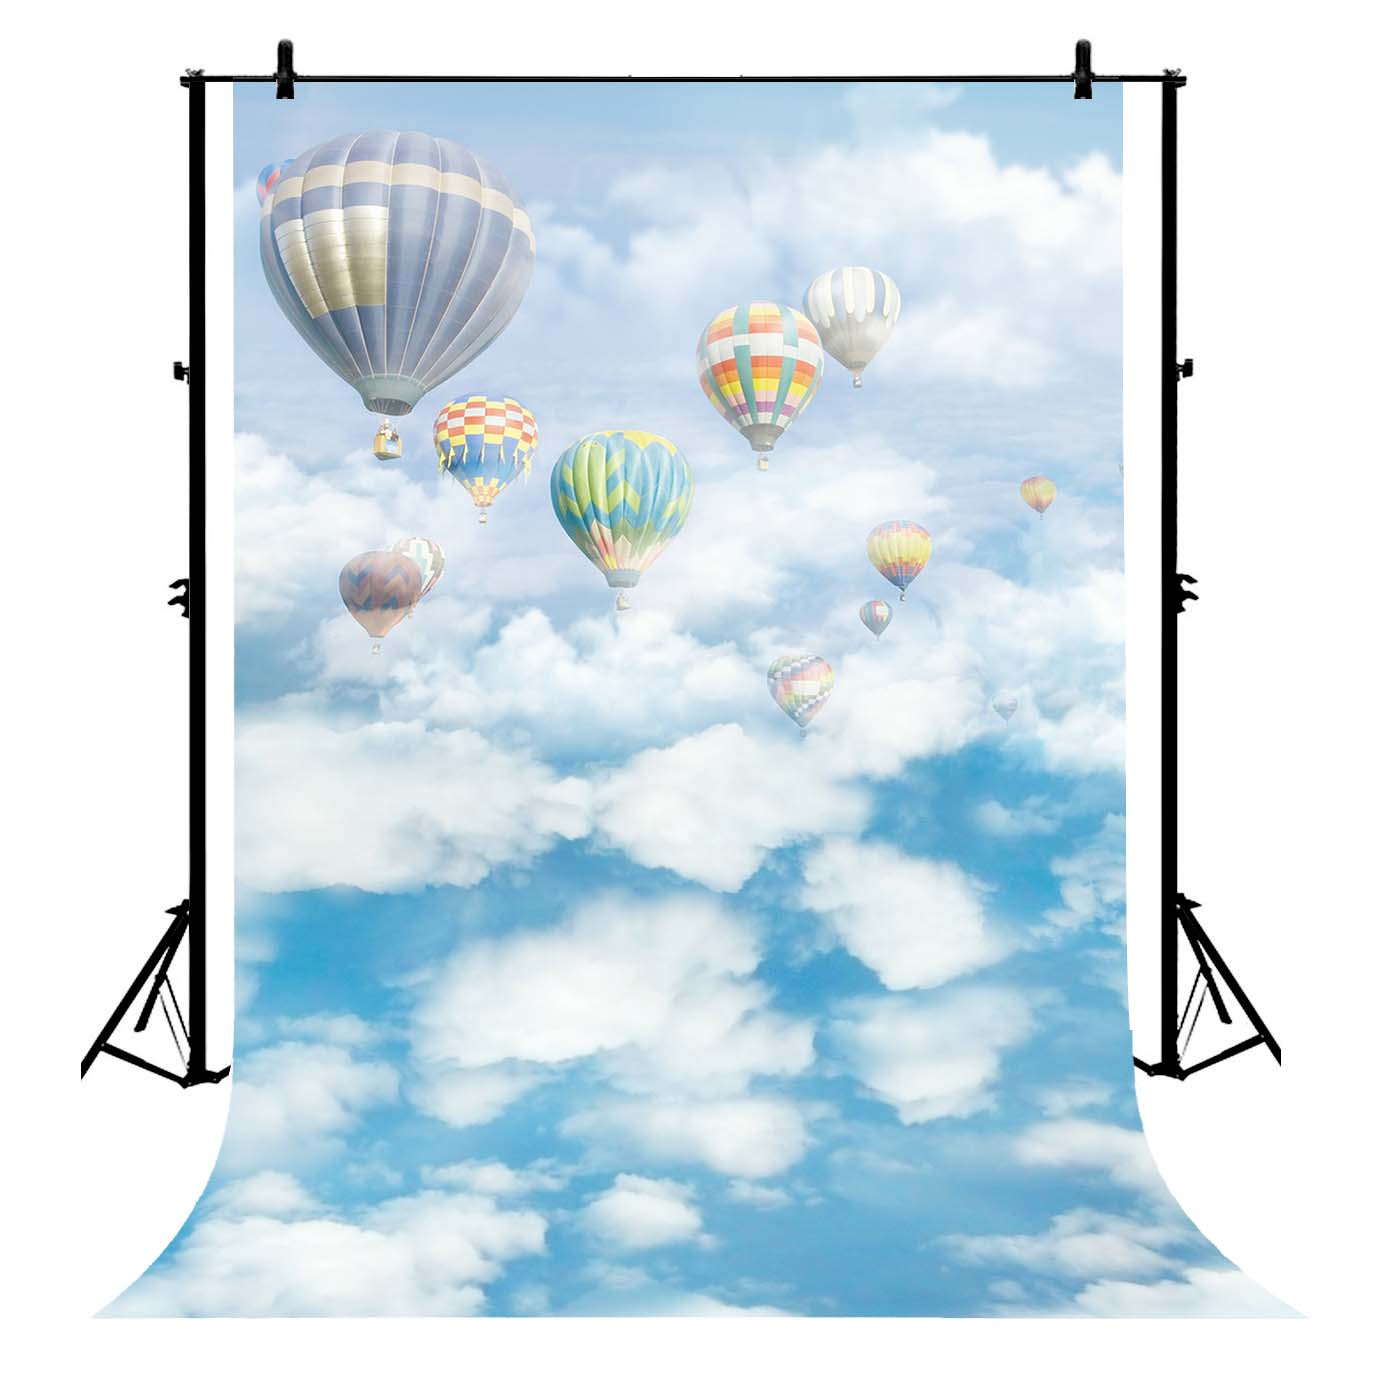 GCKG 7x5ft Hot Air Balloon on the Blue Sky White Clouds Wedding PolyesterPhotographyBackdropPhotographyPropsStudioPhotoBoothProps - image 4 de 4